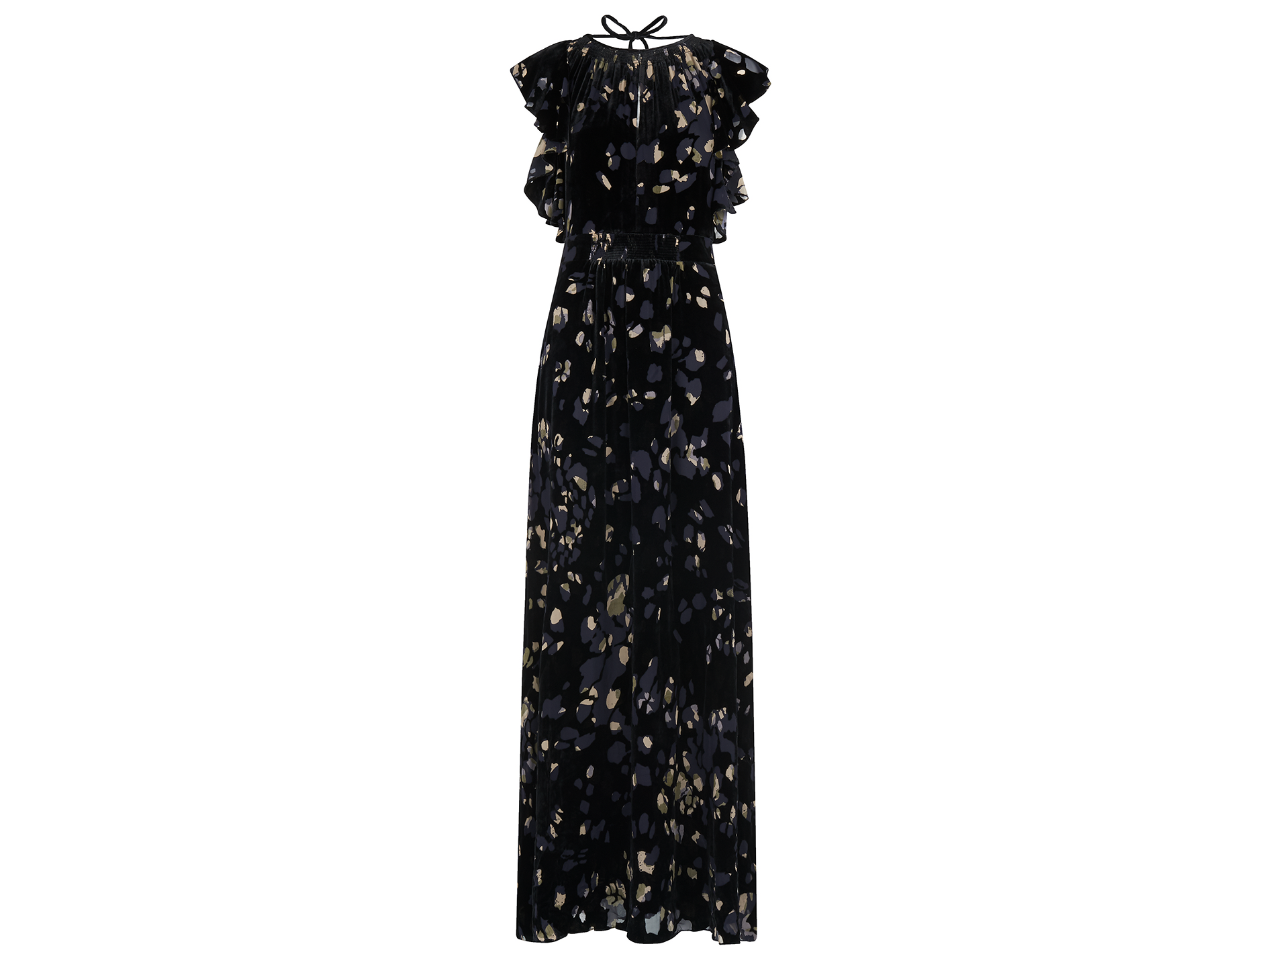 Printed Devore Maxi Dress, Wristles